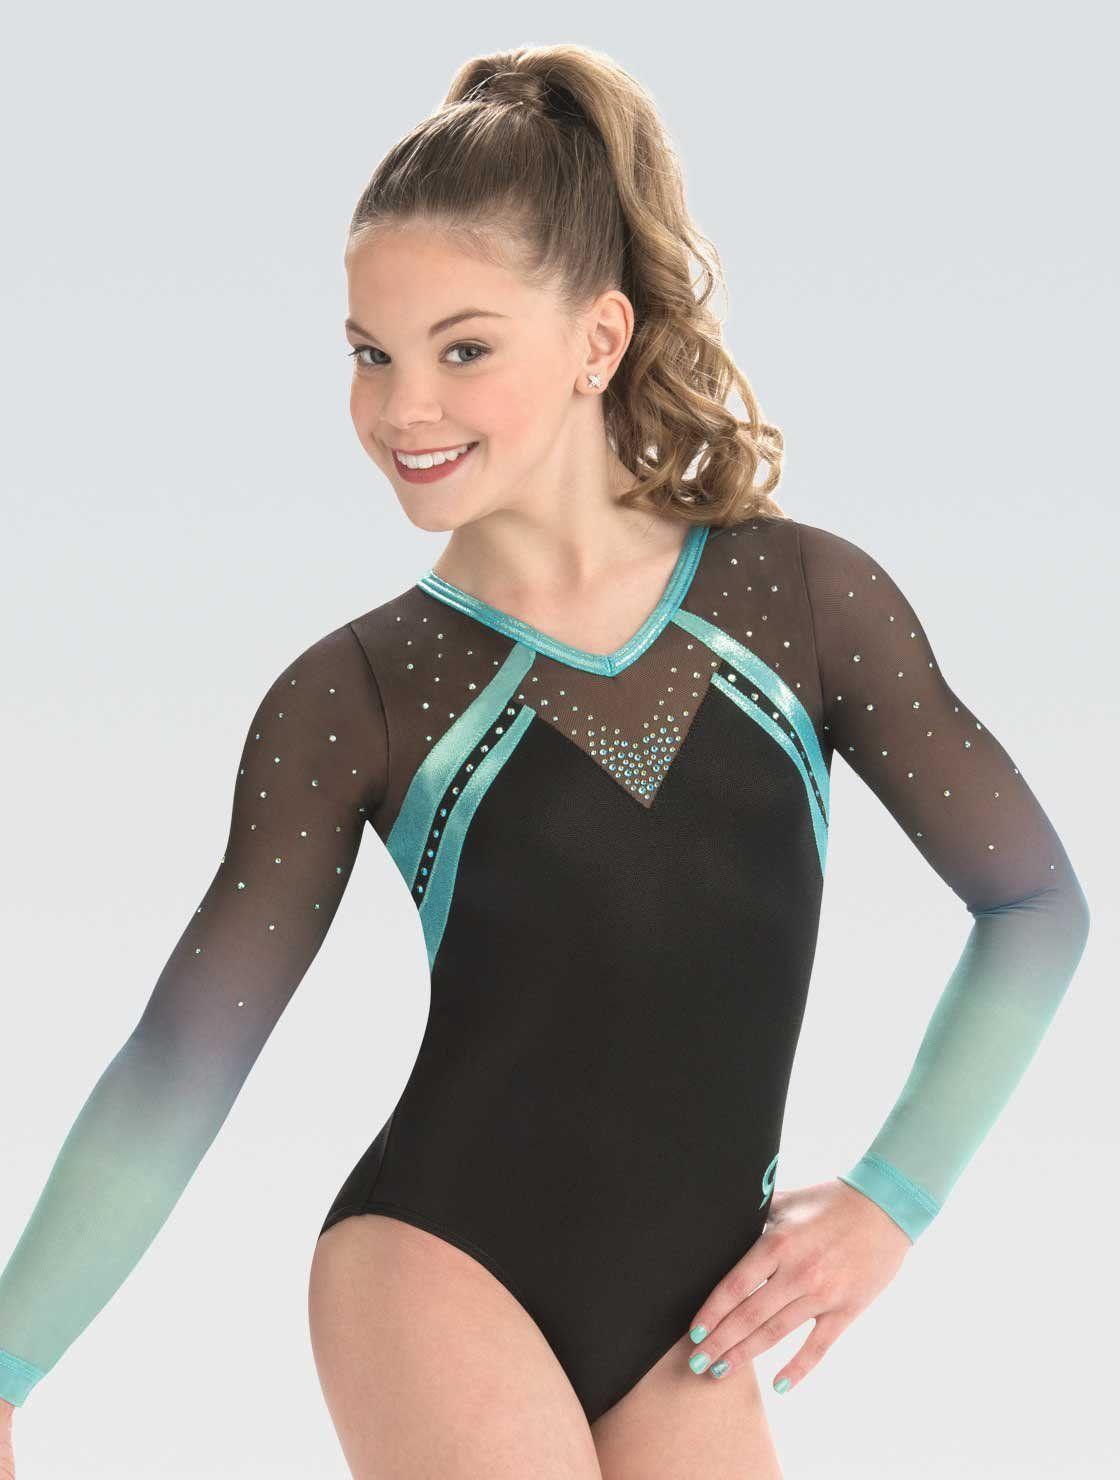 5f8e7c6890b8 7638s | Gymnastics | Gymnastics competition leotards, Girls ...